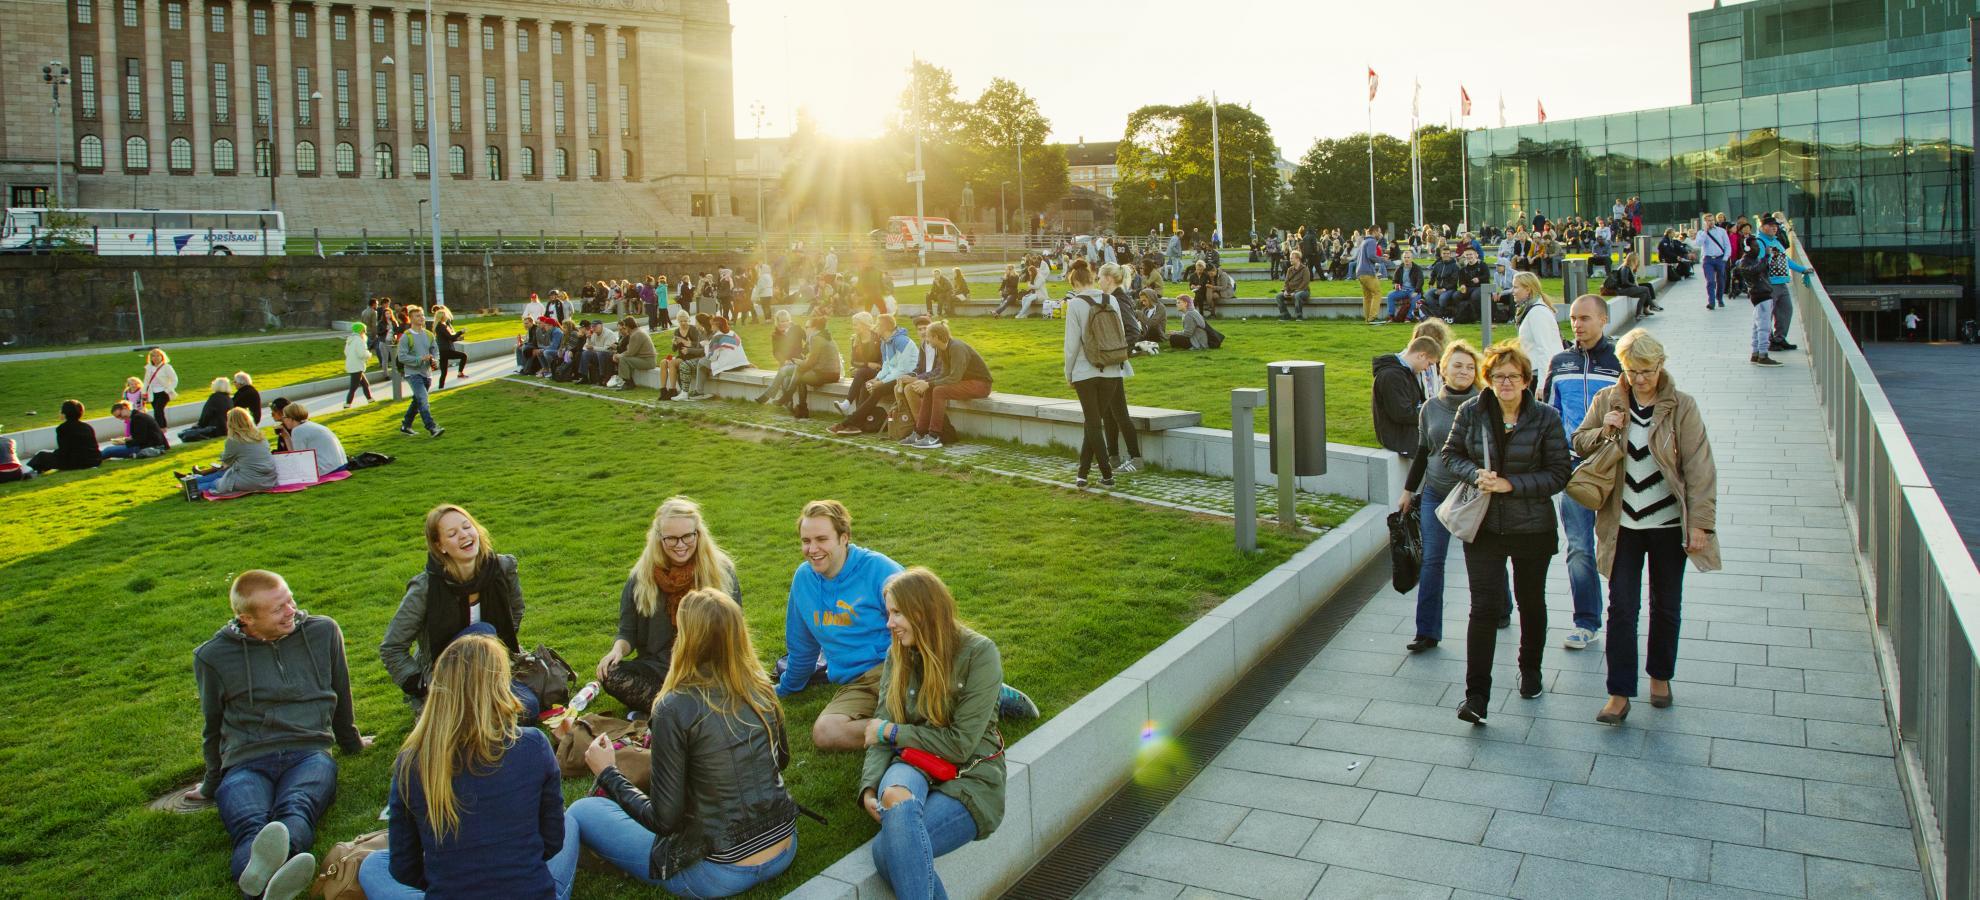 Kansalaistori Square My Helsinki